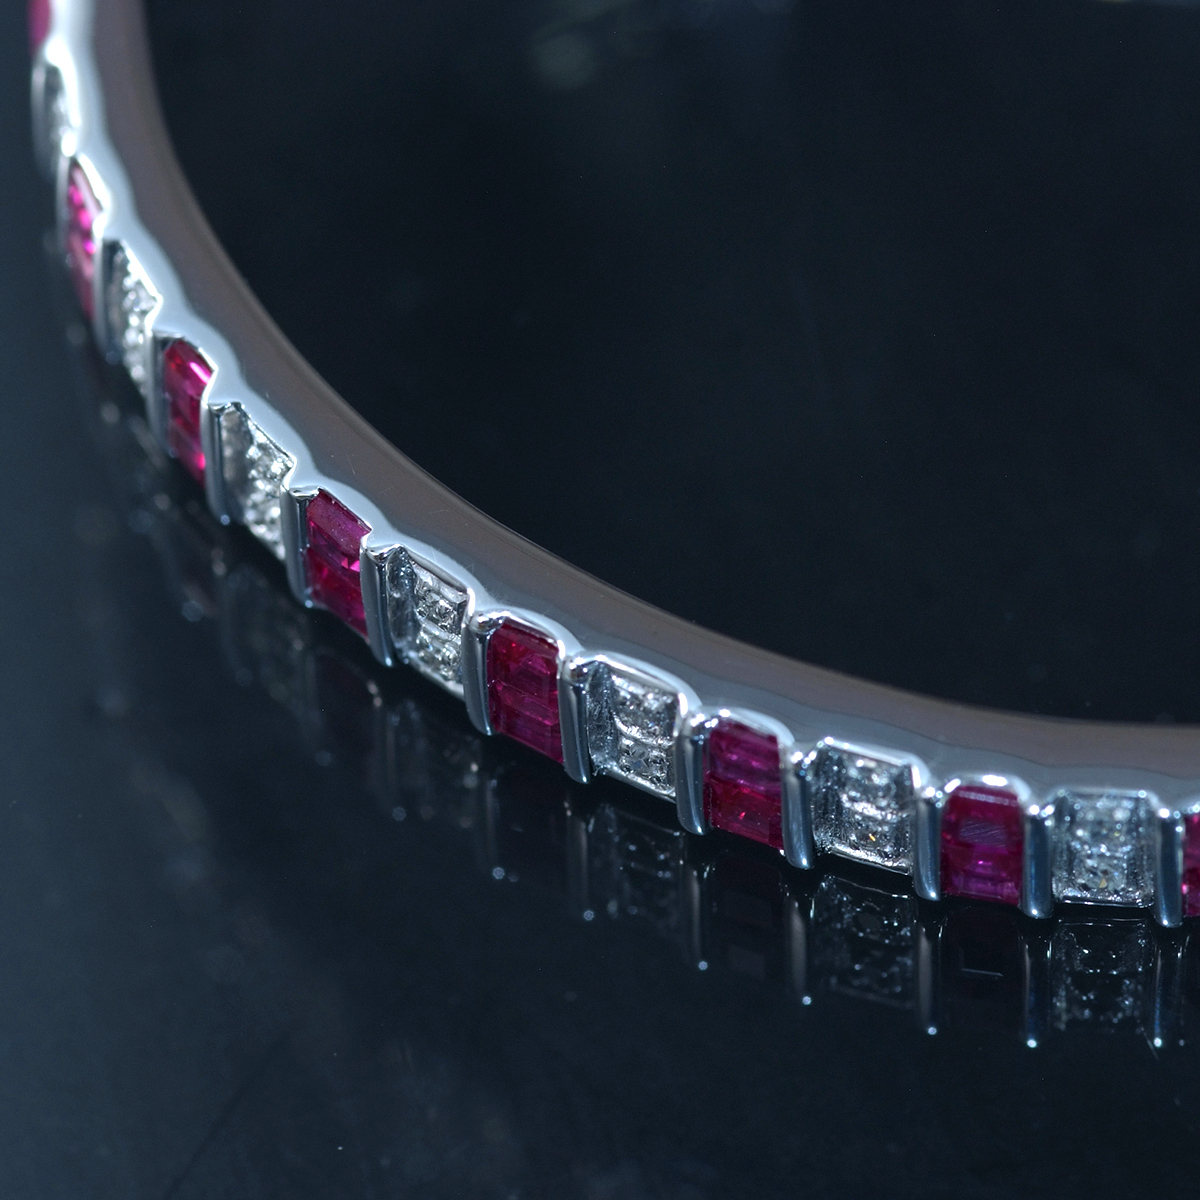 F0241 美しいルビー2.64ct 天然絶品ダイヤモンド0.12ct 最高級14金WG無垢バングル 腕周り15.5cm 重量15.06g 縦幅6.09mm_画像4